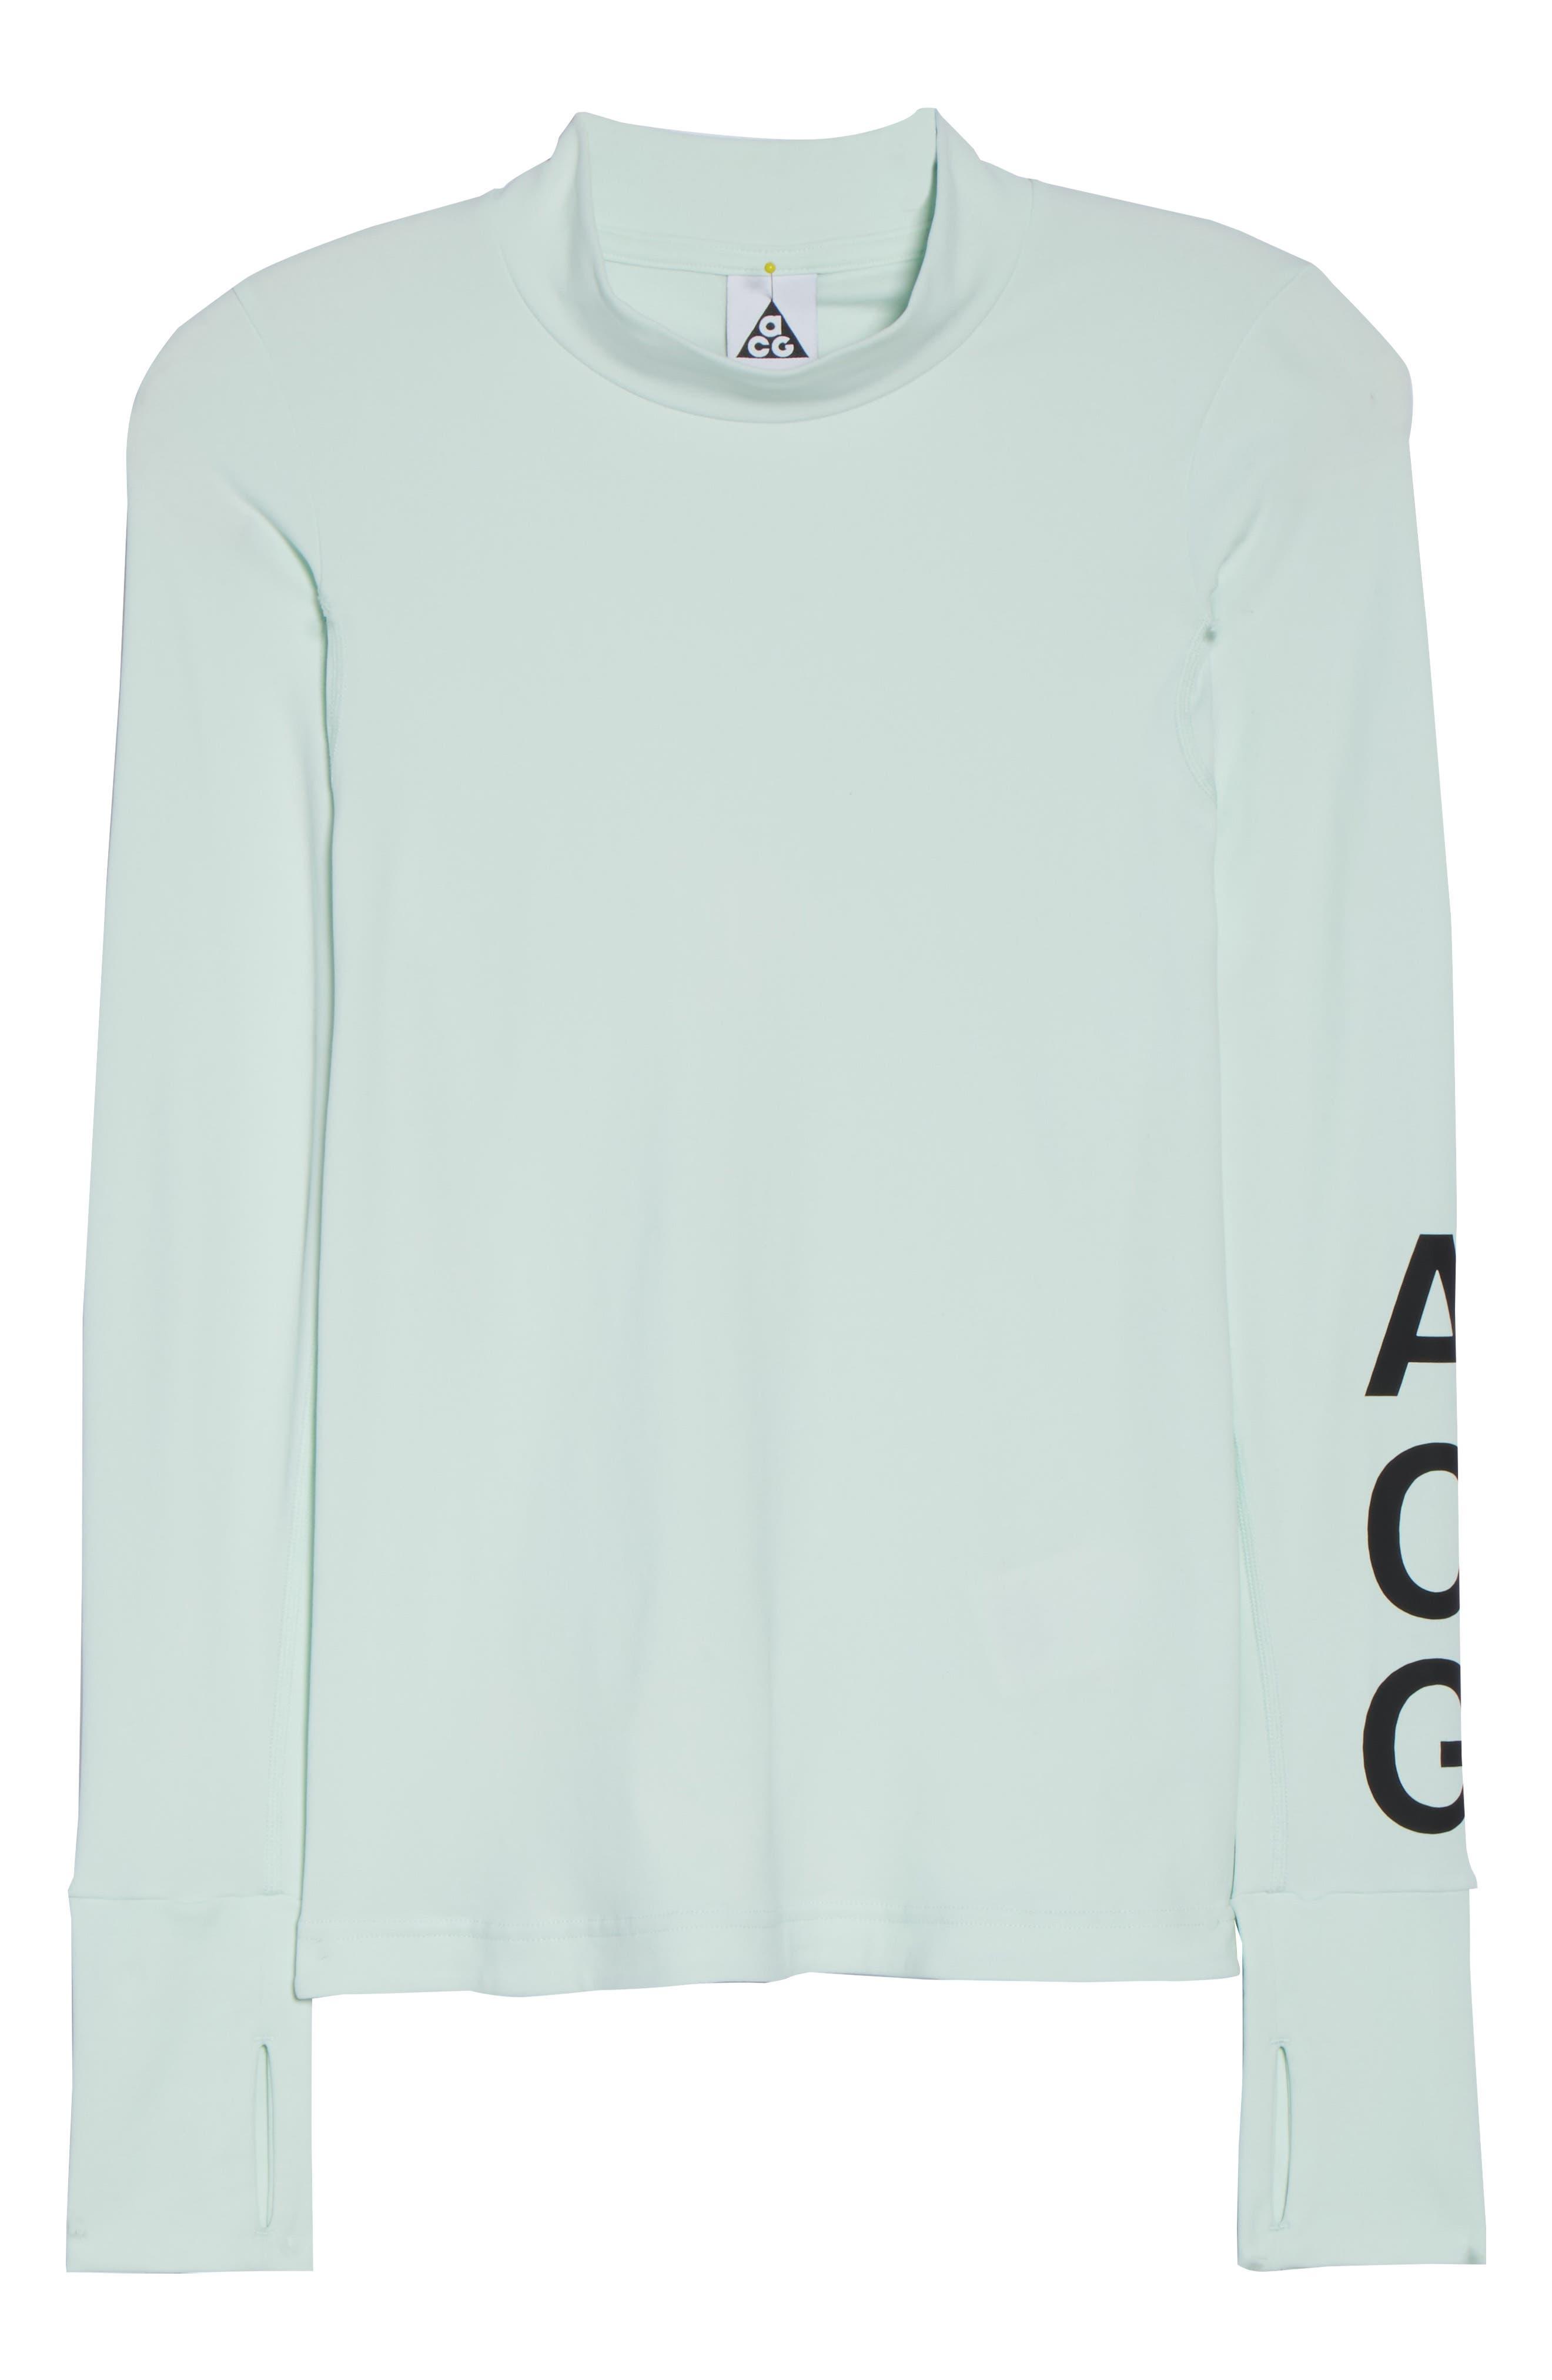 NikeLab ACG Long Sleeve Women's Top,                             Alternate thumbnail 7, color,                             Barely Green/ Black